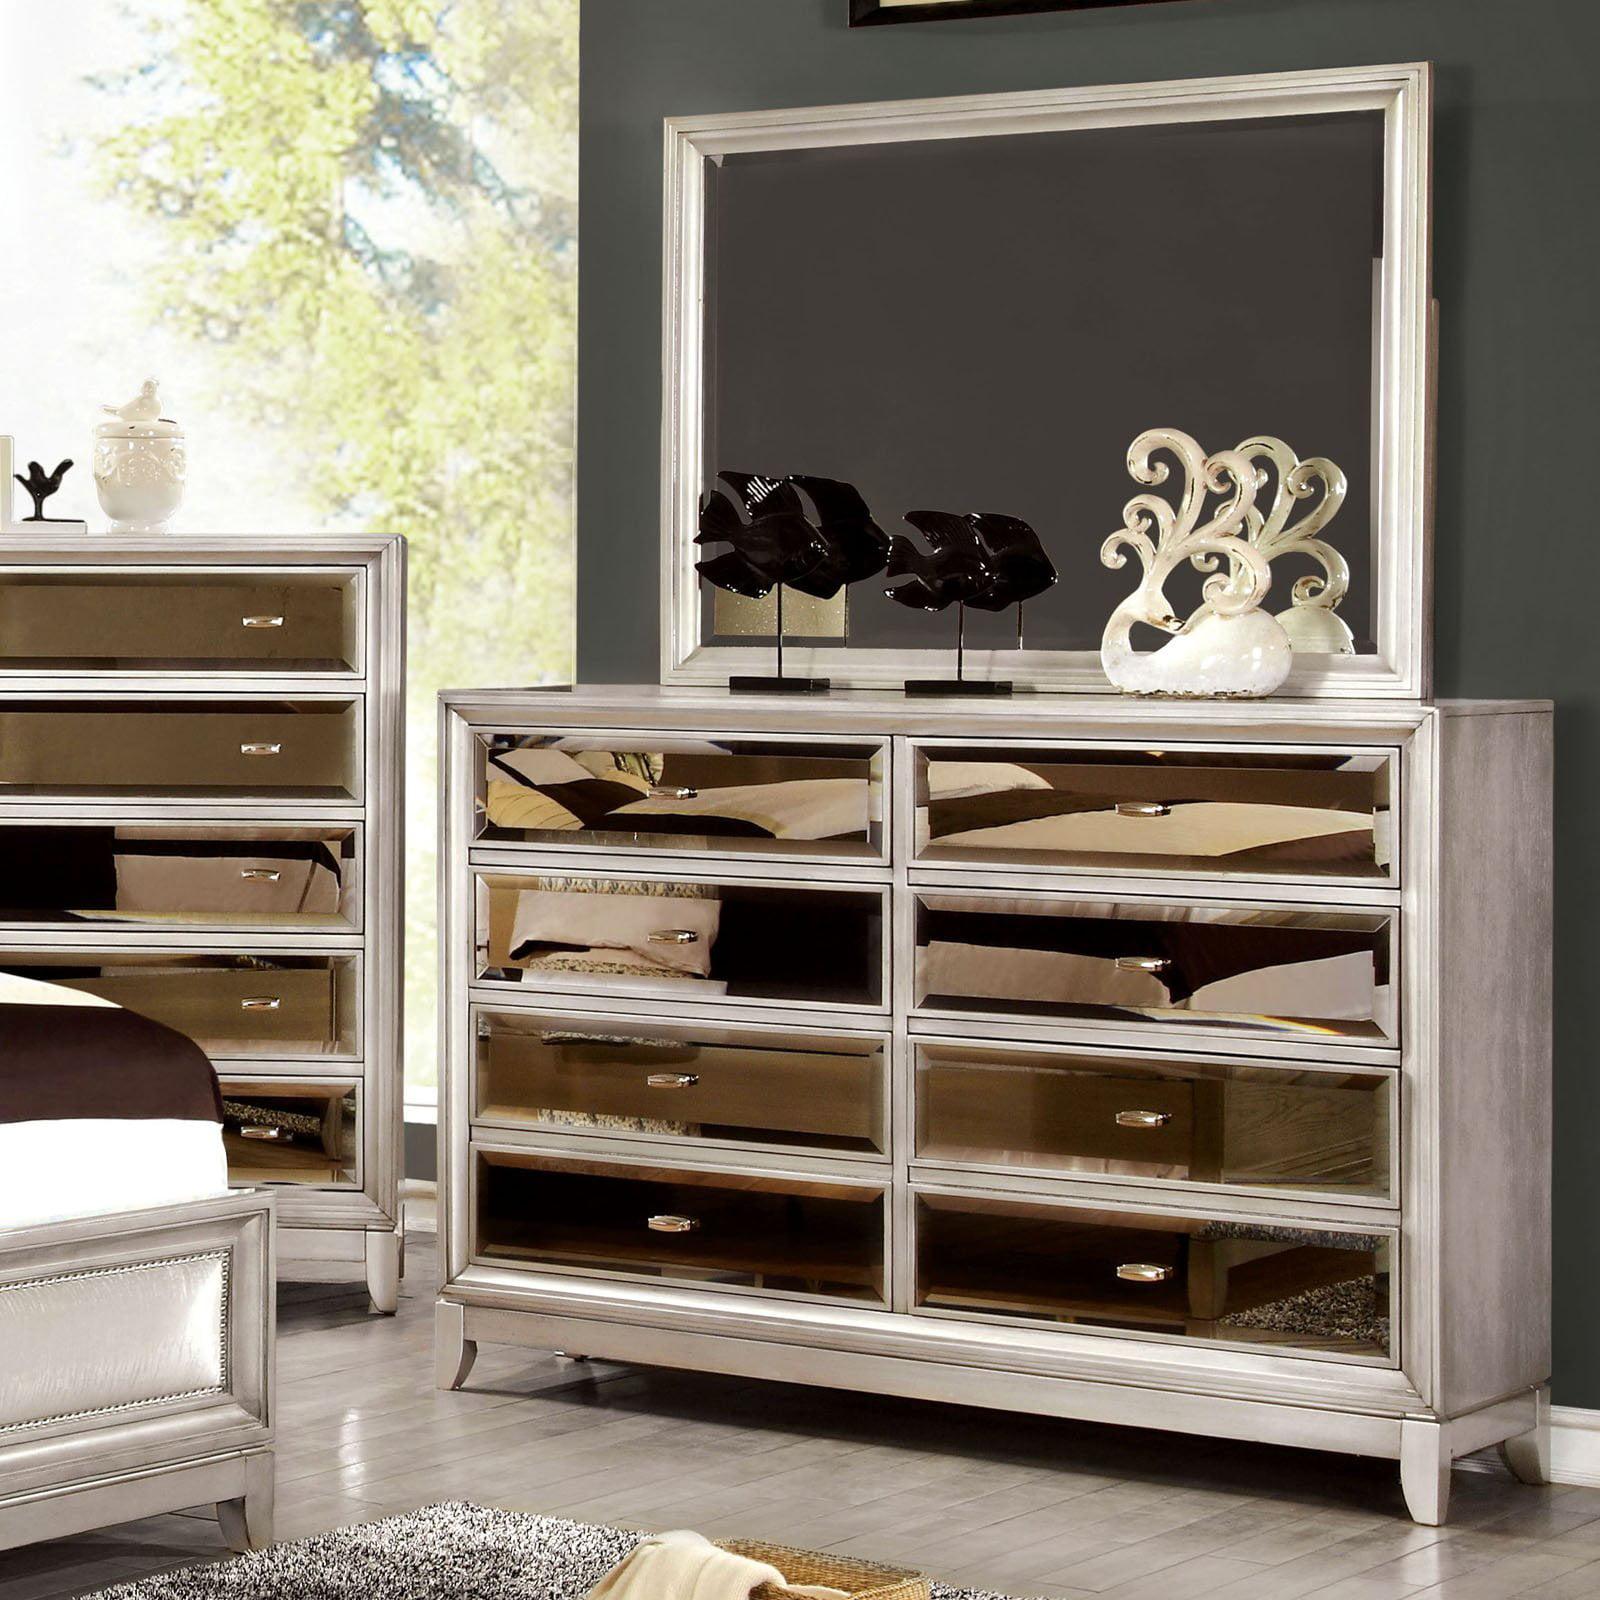 Furniture Of America Glaciara 8 Drawer Dresser With Mirror